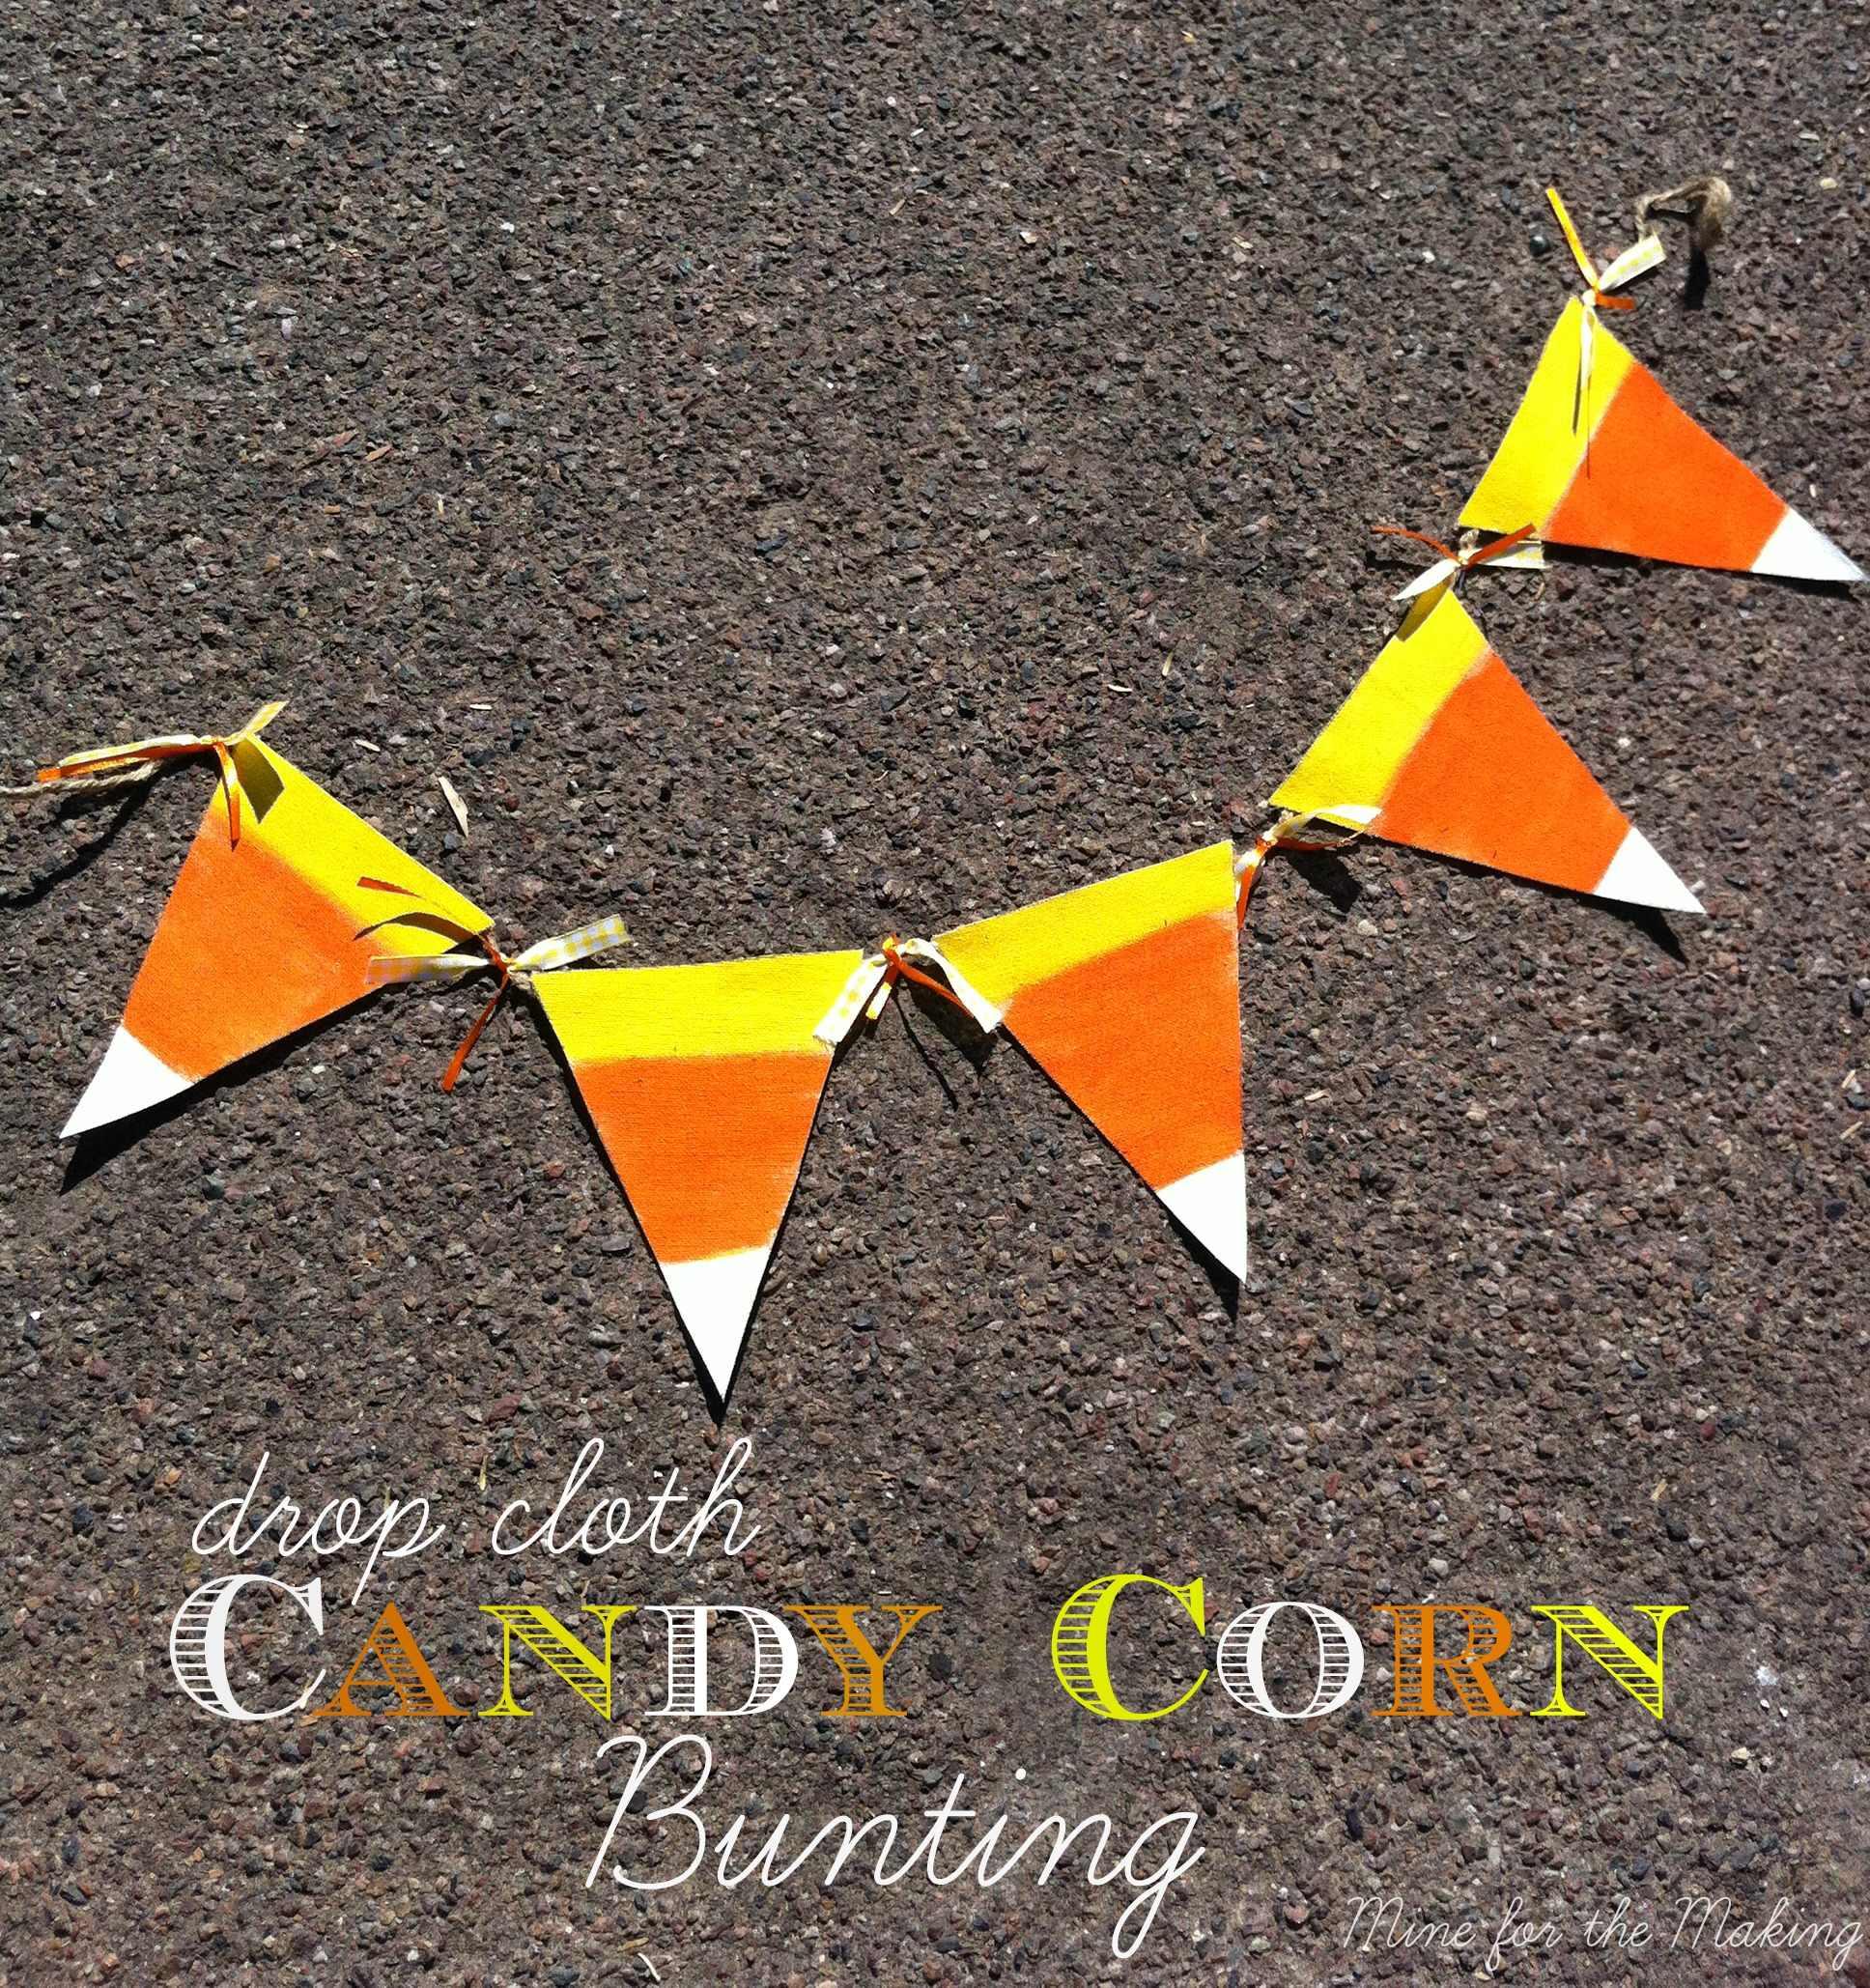 Drop Cloth Candy Corn Bunting